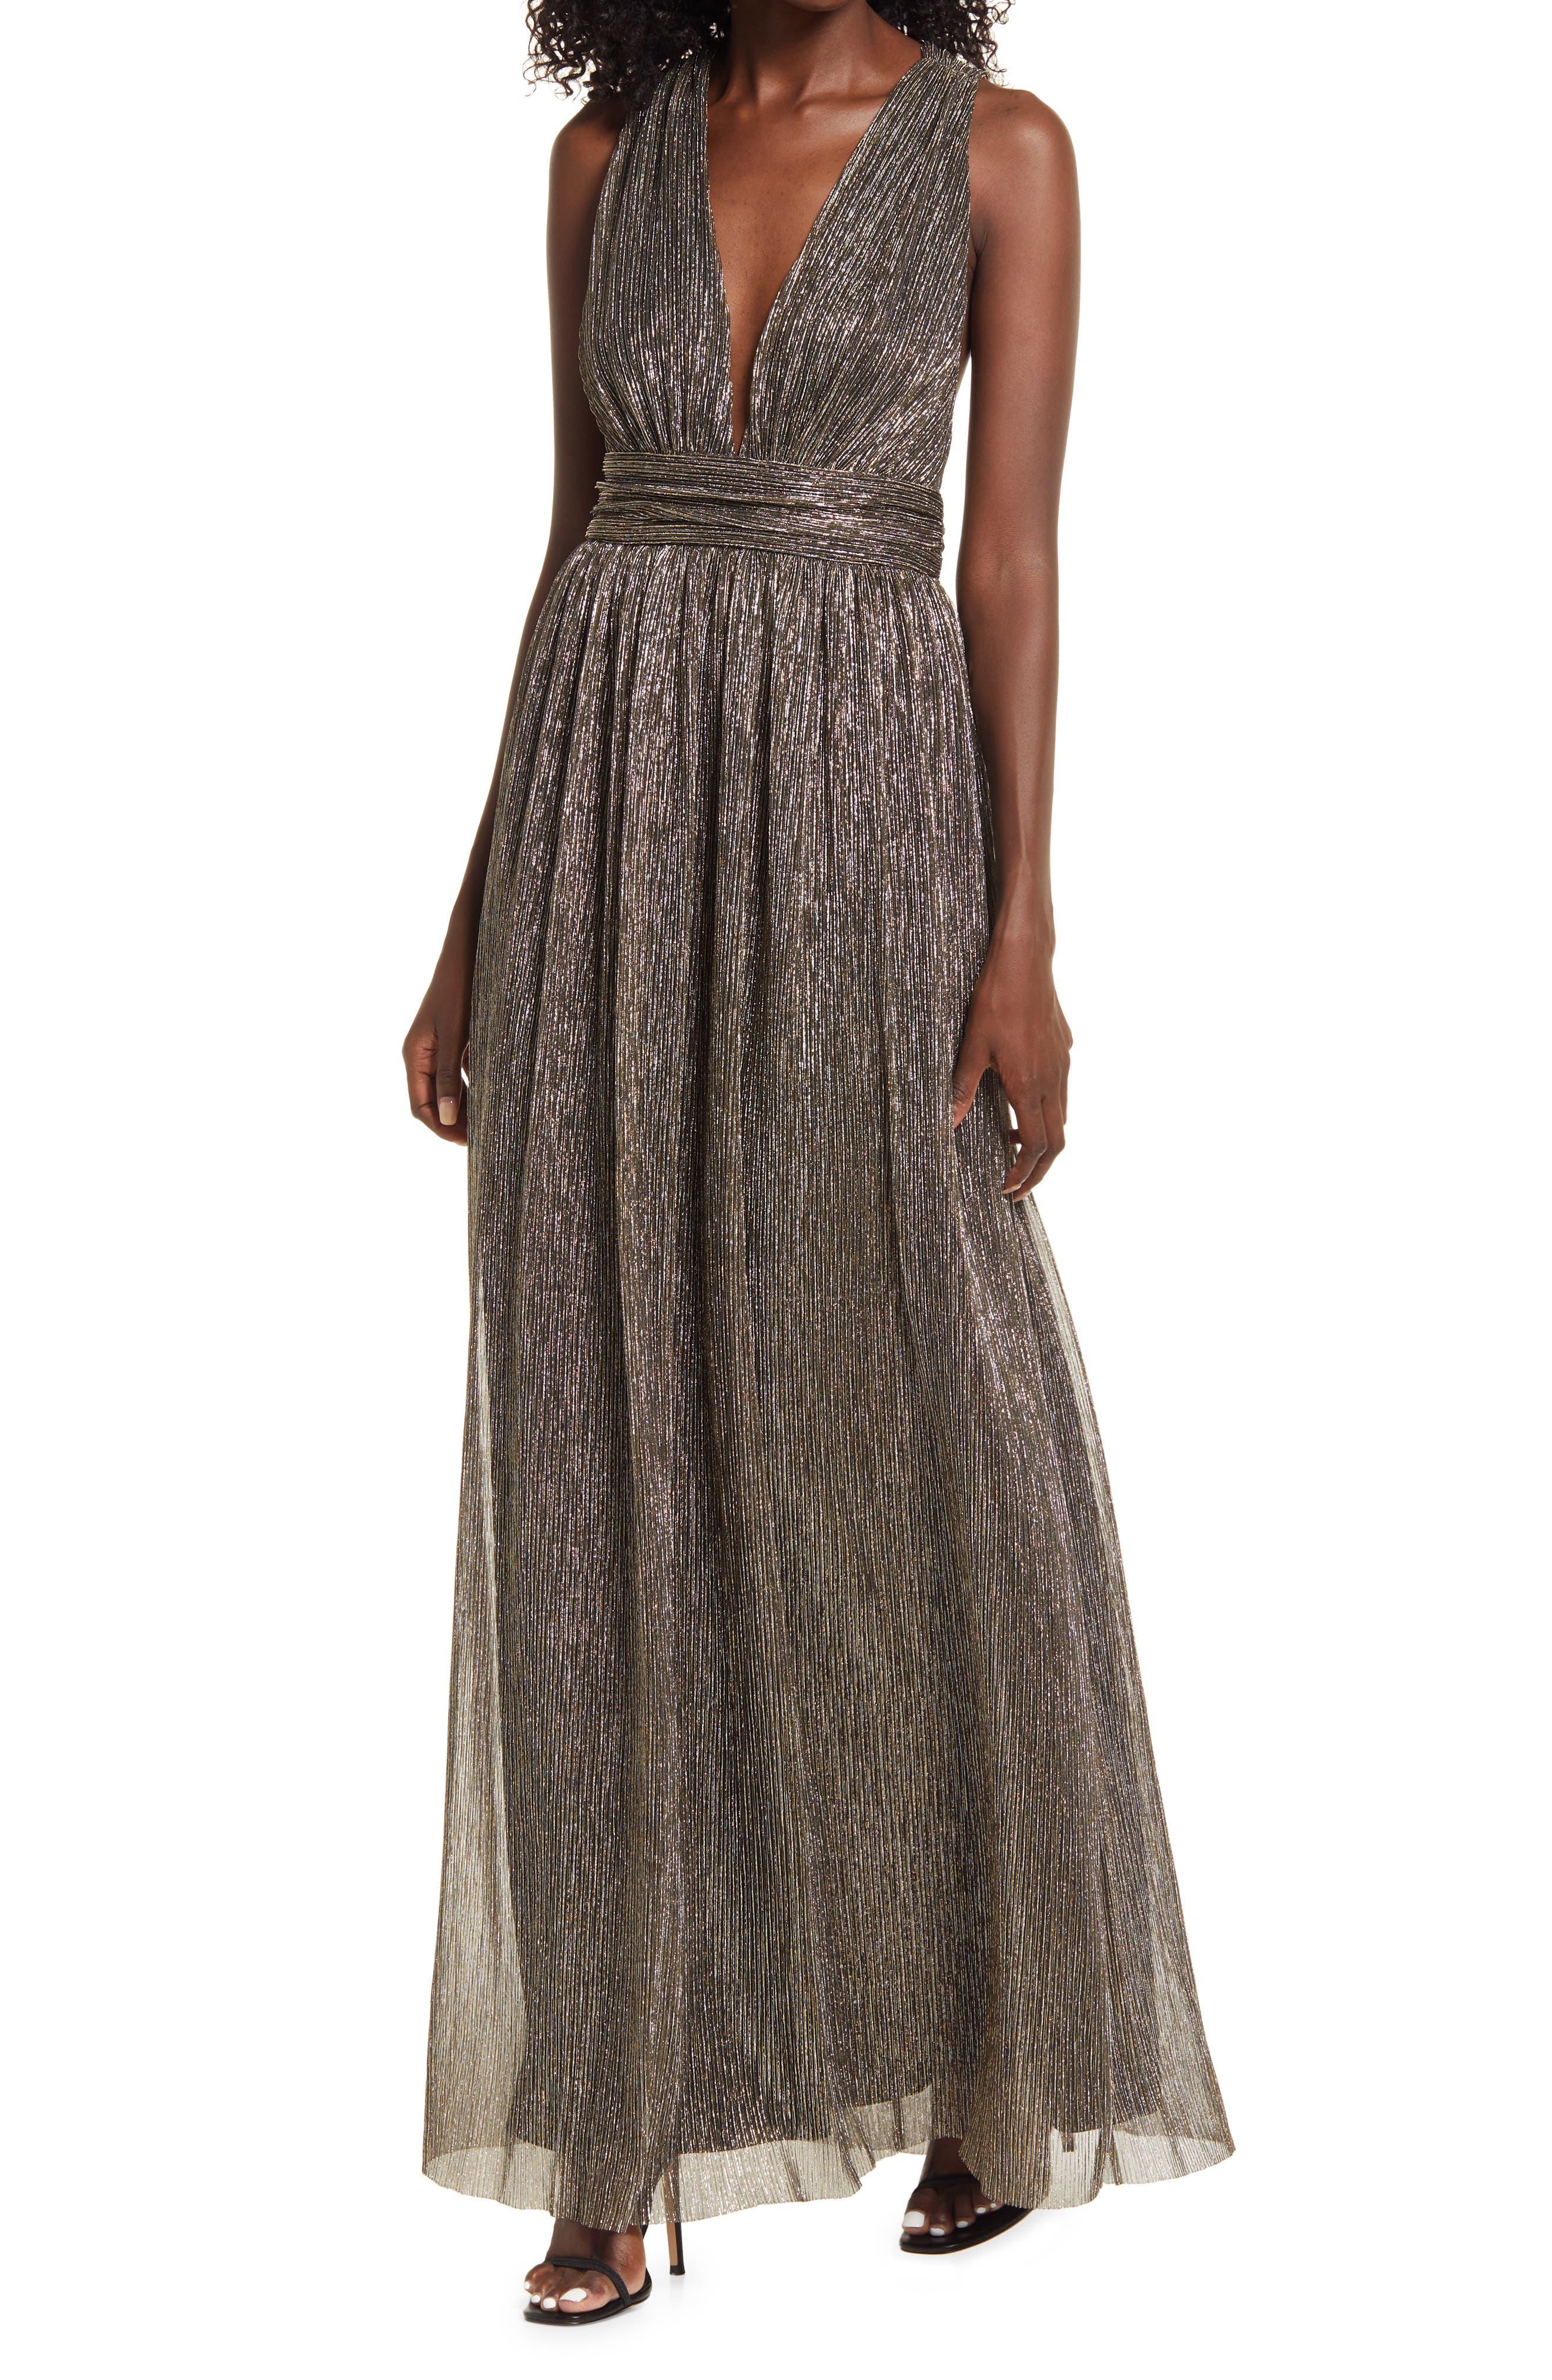 70s Sequin Dresses, Disco Dresses Womens Lulus Looking Radiant Metallic Evening Gown Size Large - Black $74.00 AT vintagedancer.com